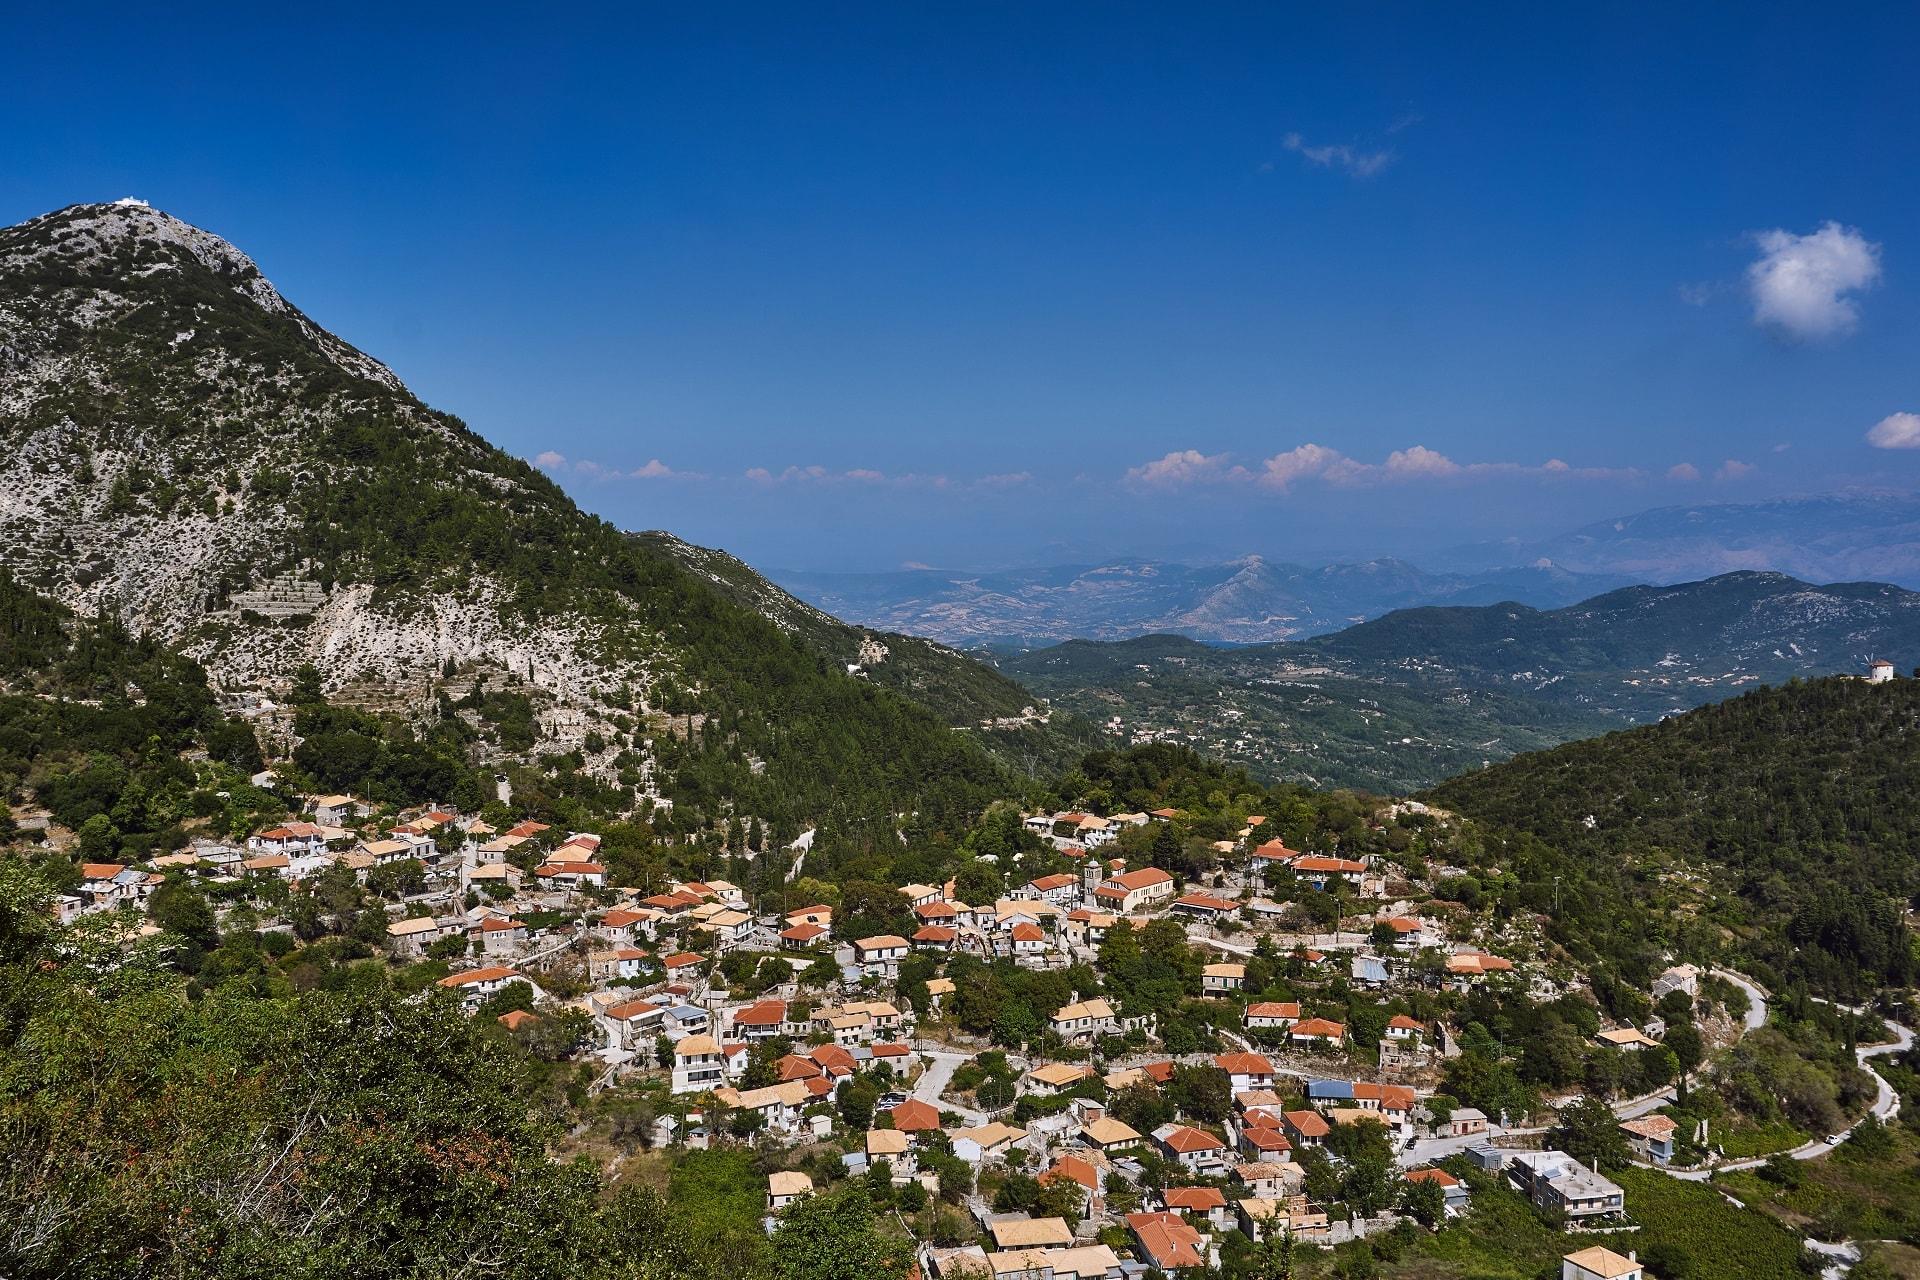 village of lefkada island